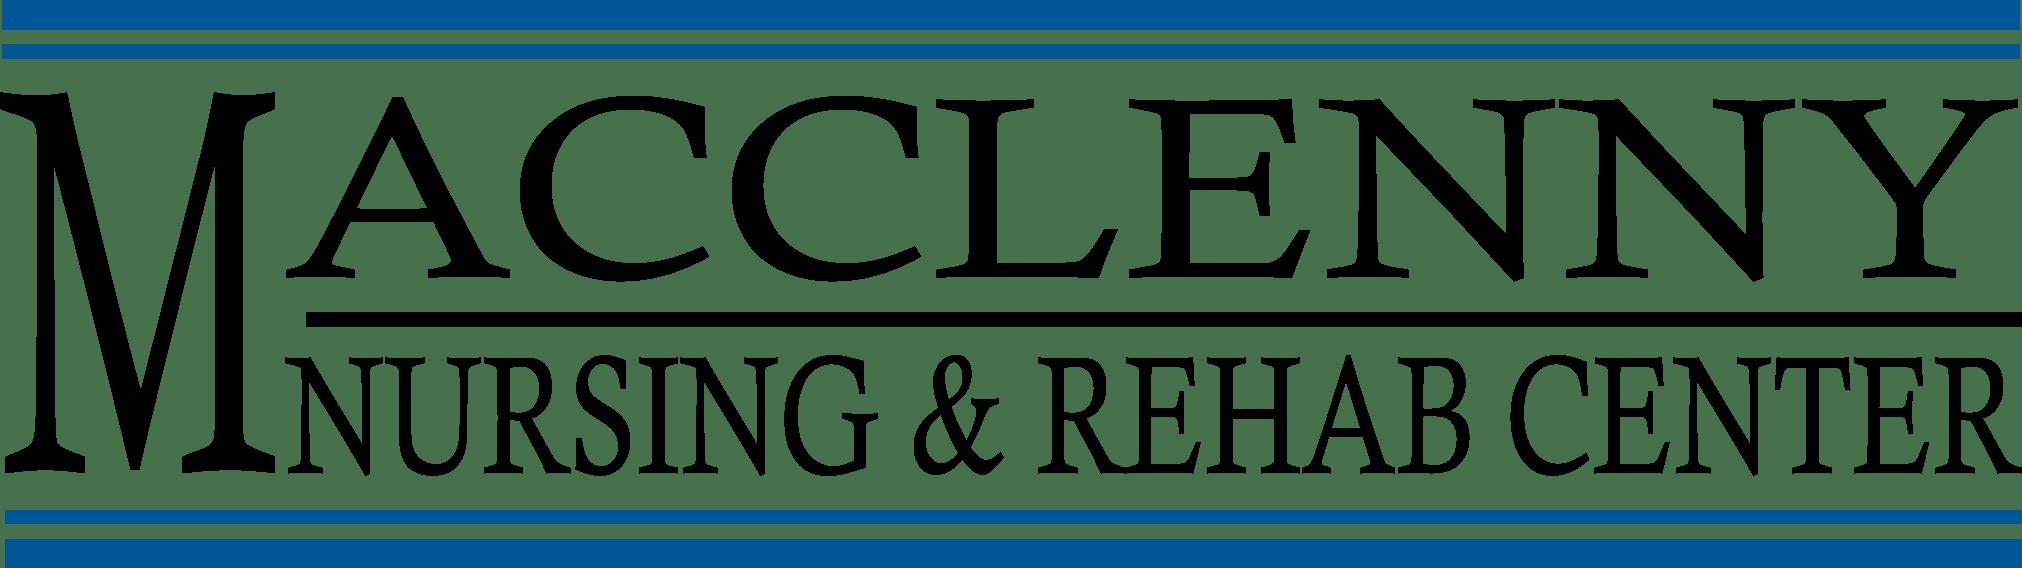 Macclenny Nursing & Rehab Center logo